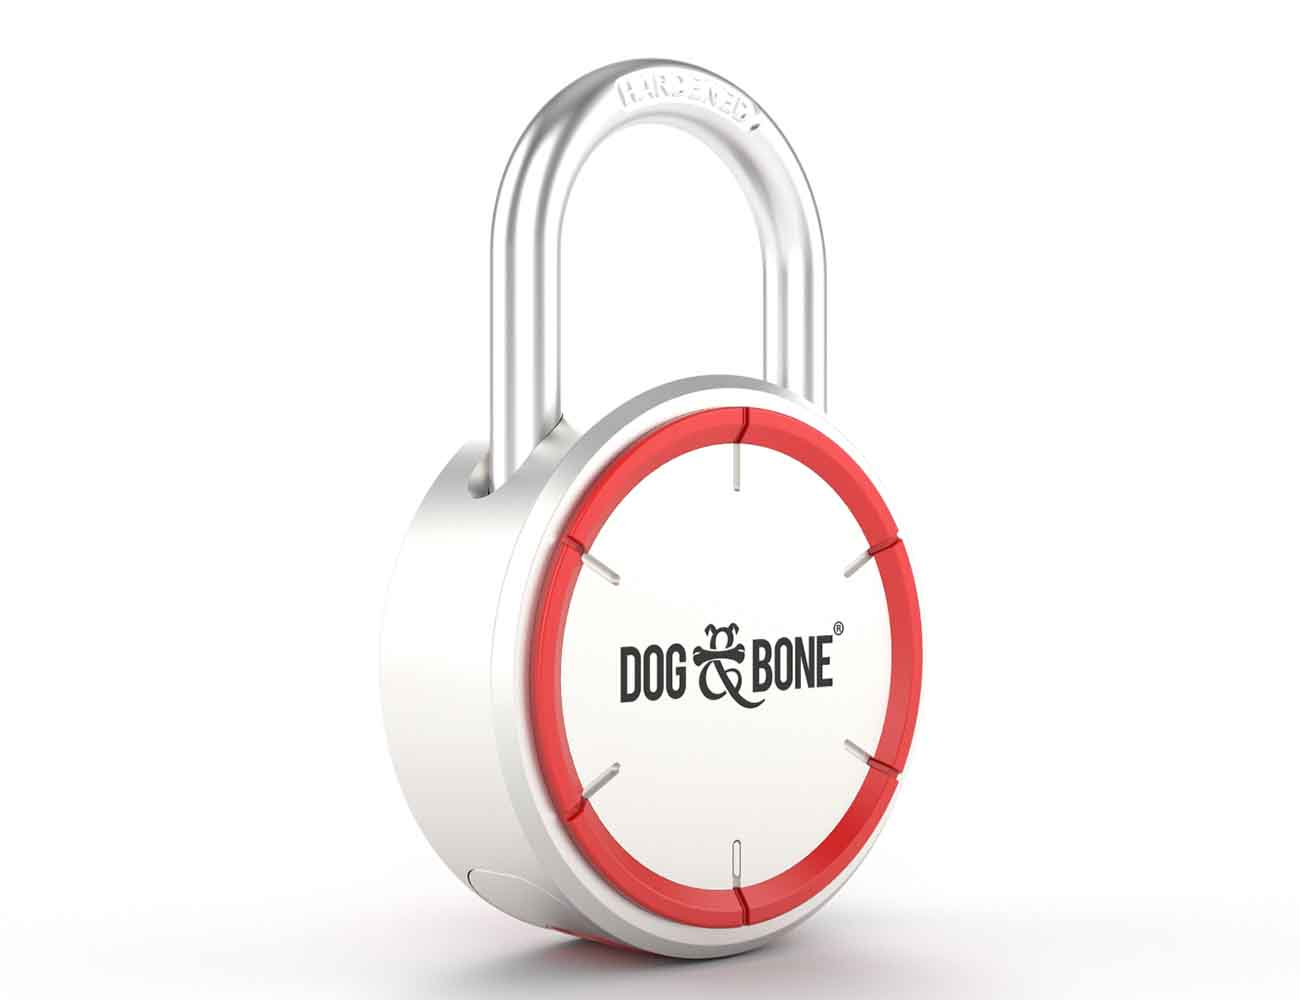 LockSmart Bluetooth Padlock by Dog & Bone